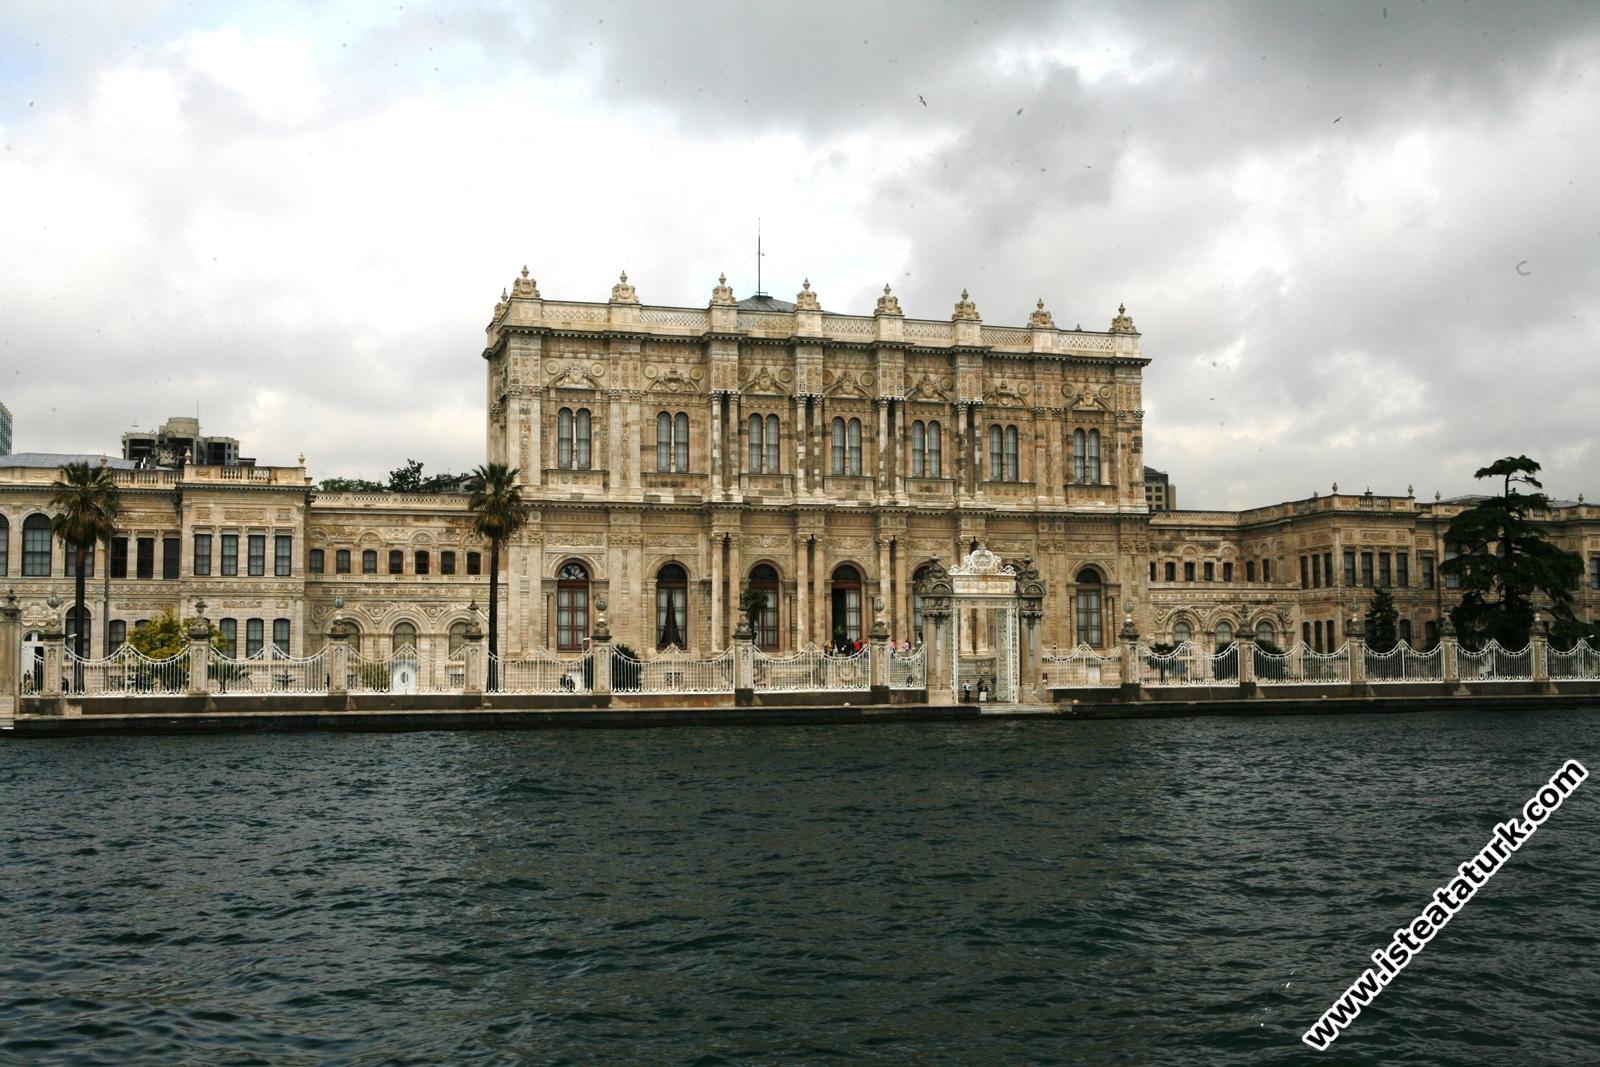 İstanbul - Dolmabahçe Sarayı